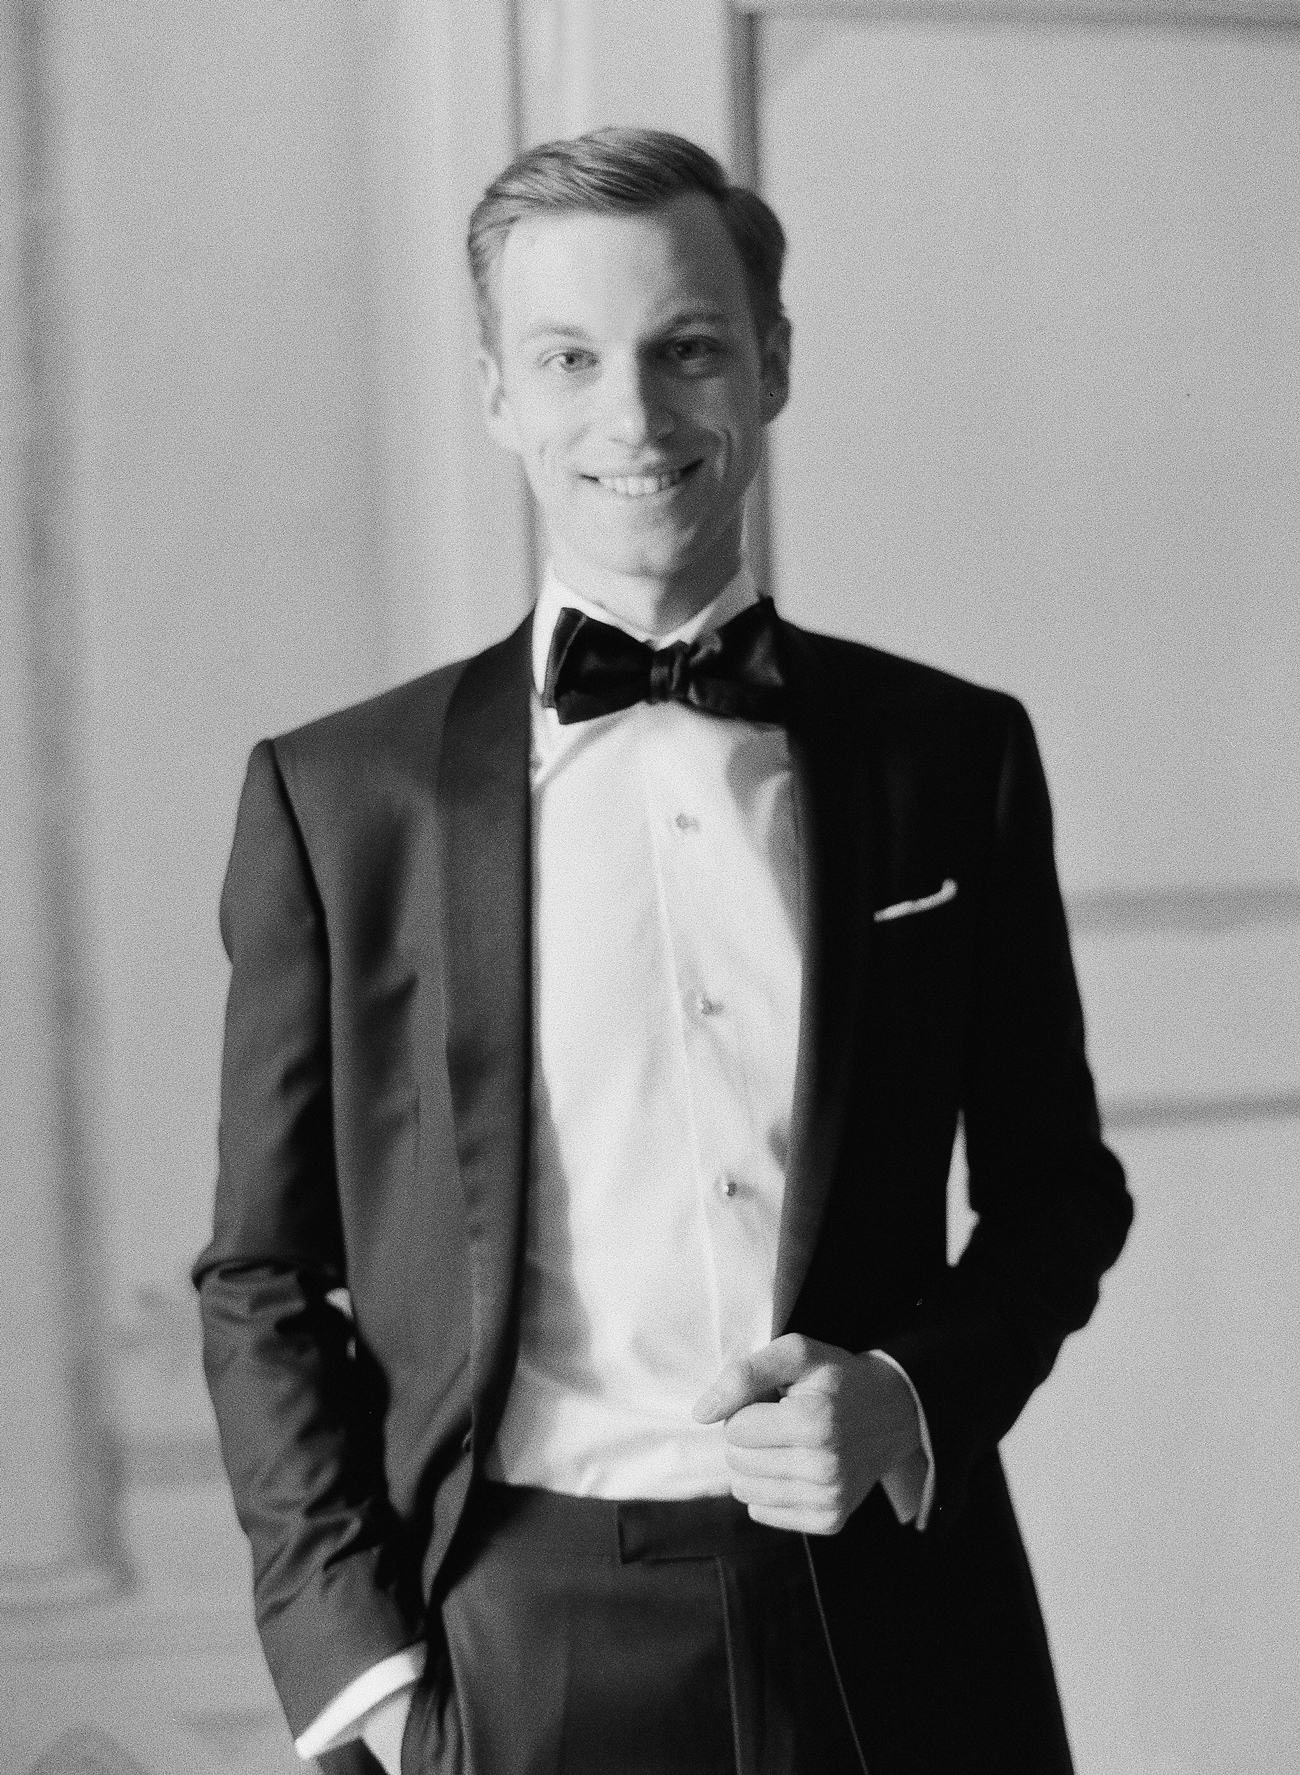 groom wearing custom midnight blue tuxedo